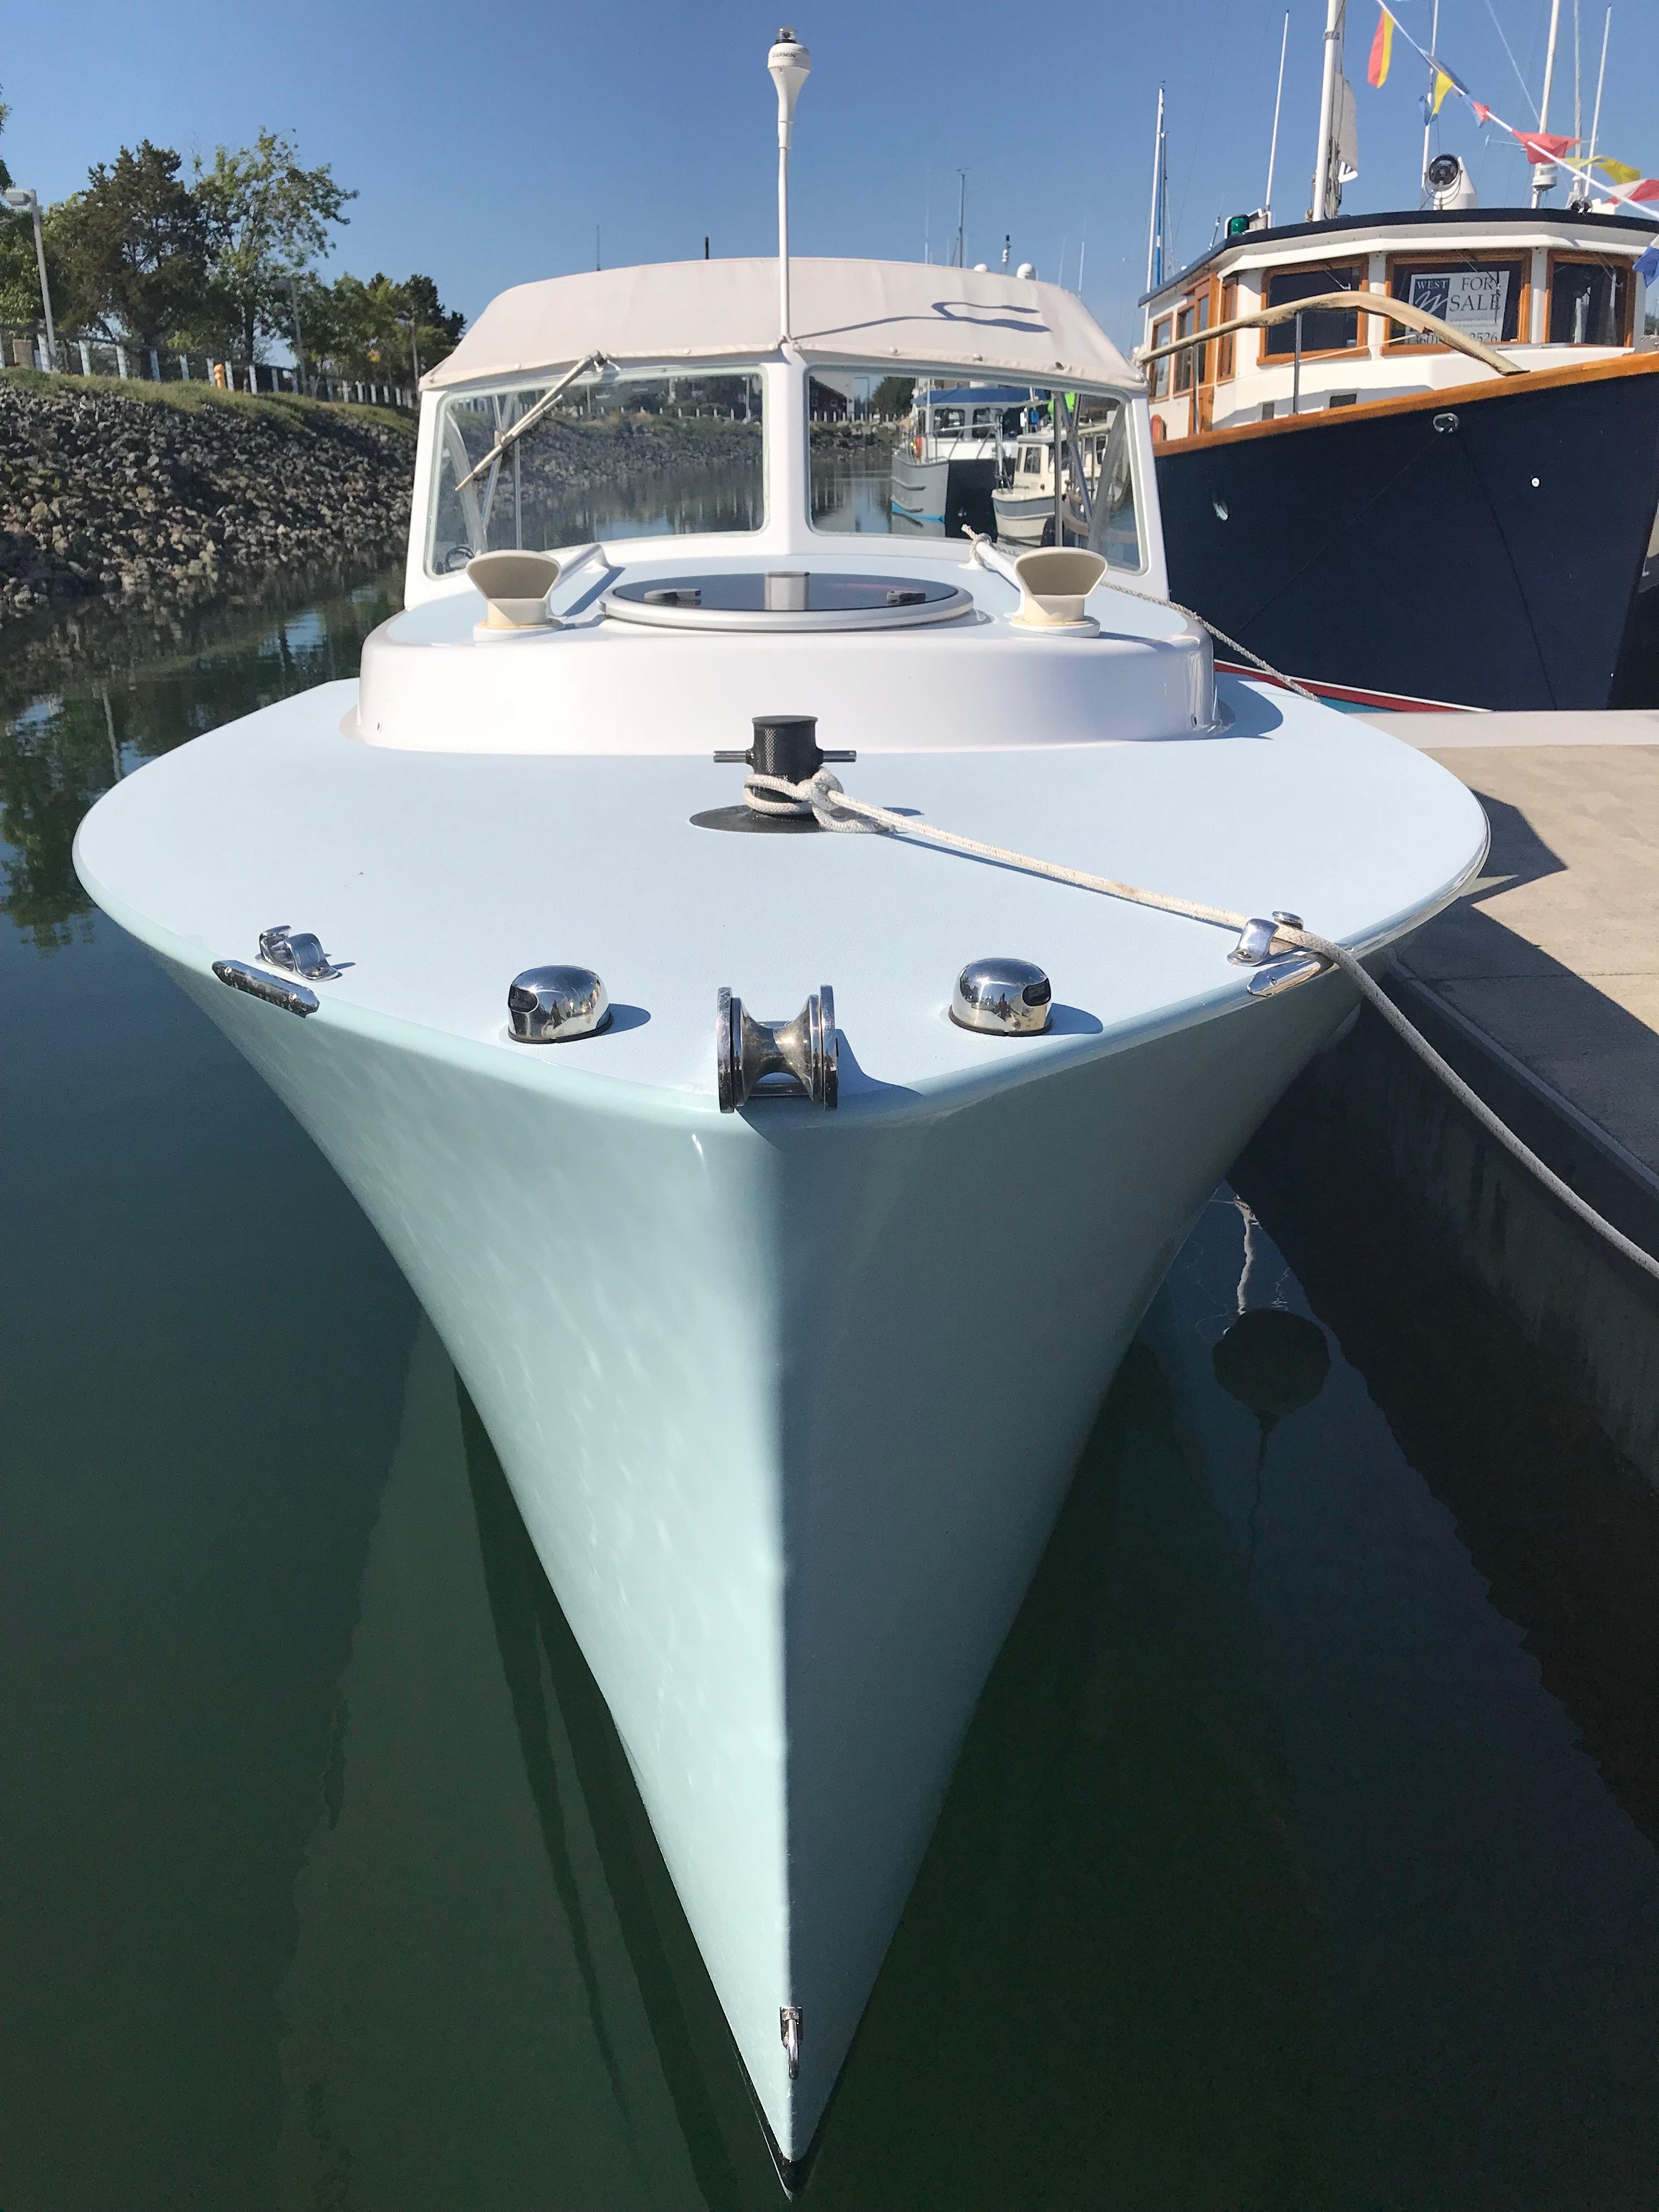 2005 ShearWater 25 Cabin Cruiser Power Boat For Sale - www.yachtworld.com